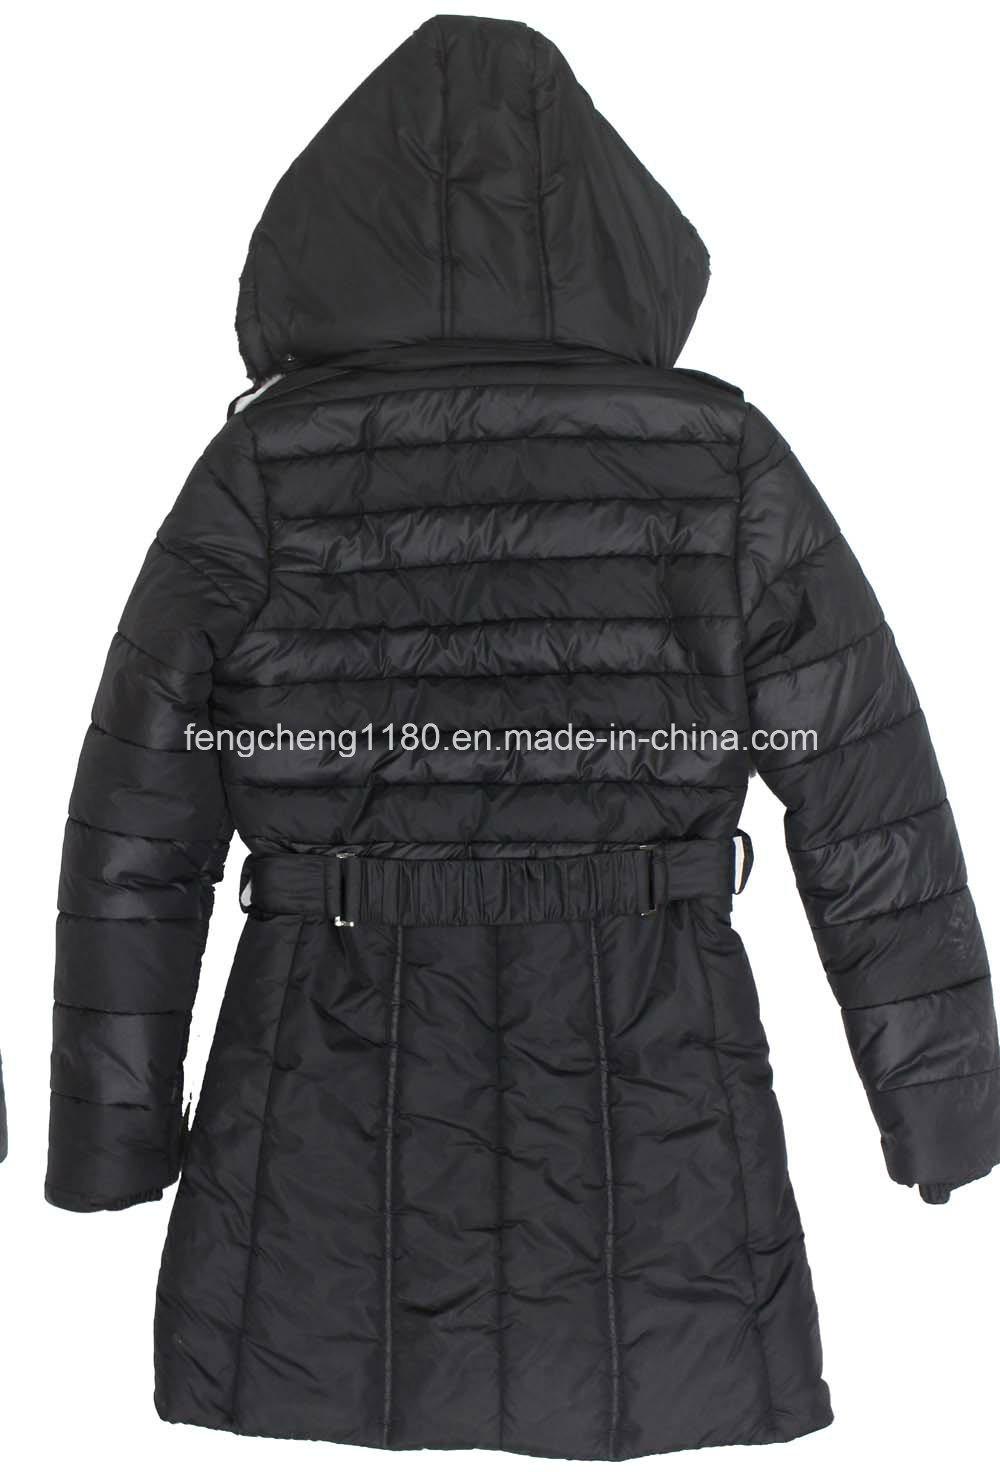 Women′s Winter Padding Jacket/Coat with Detachable Hooded